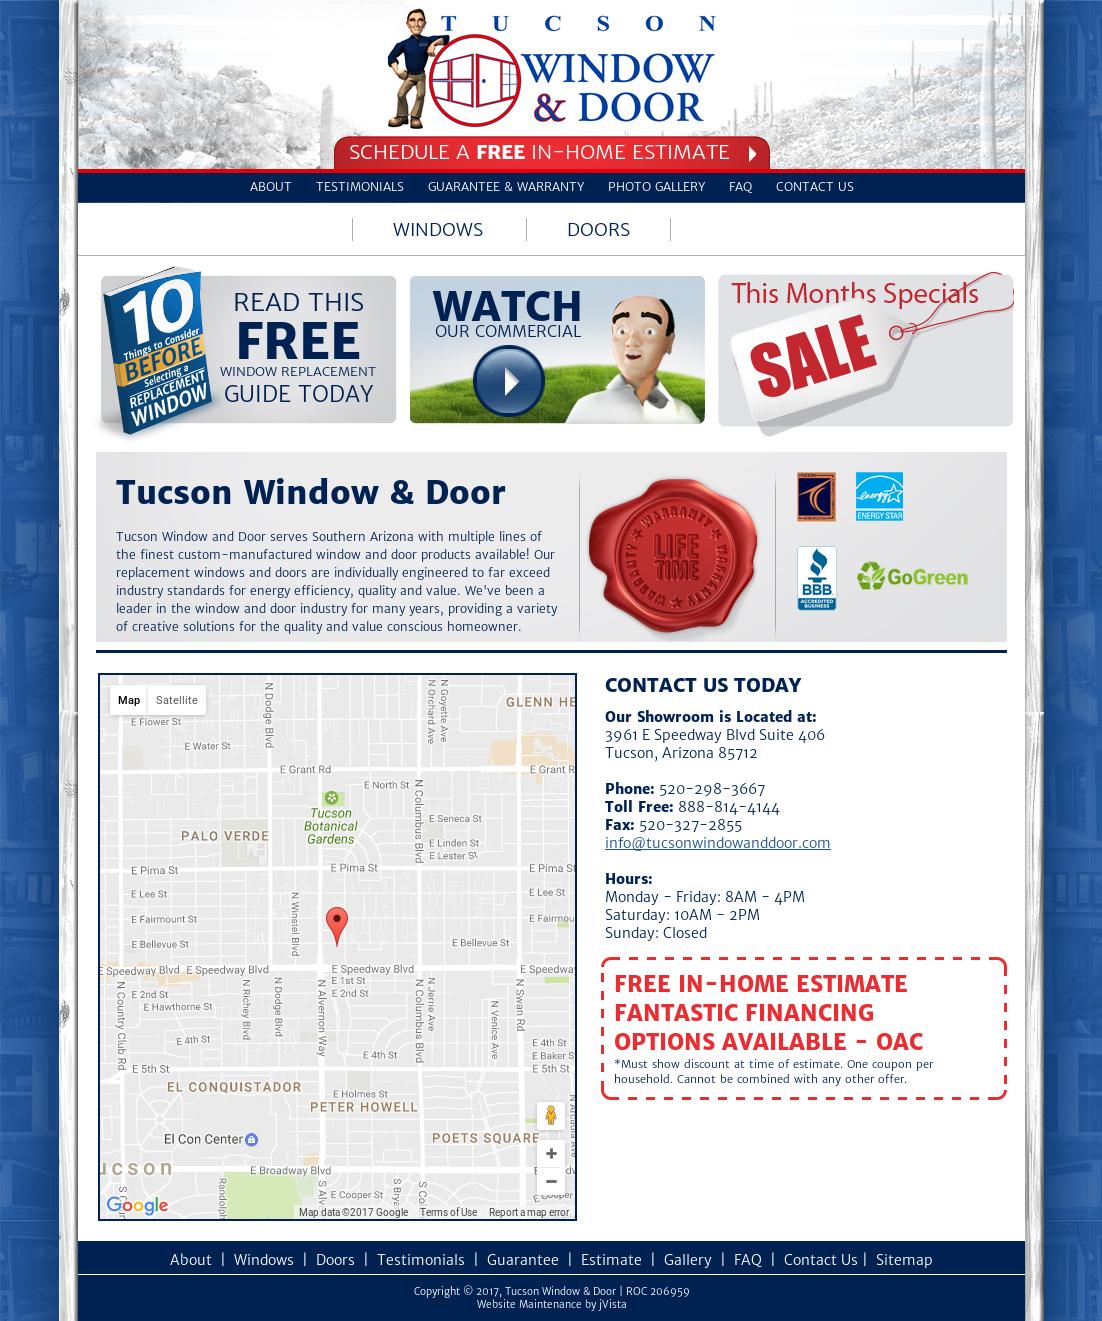 Tucson Window U0026 Door Competitors, Revenue And Employees   Owler Company  Profile